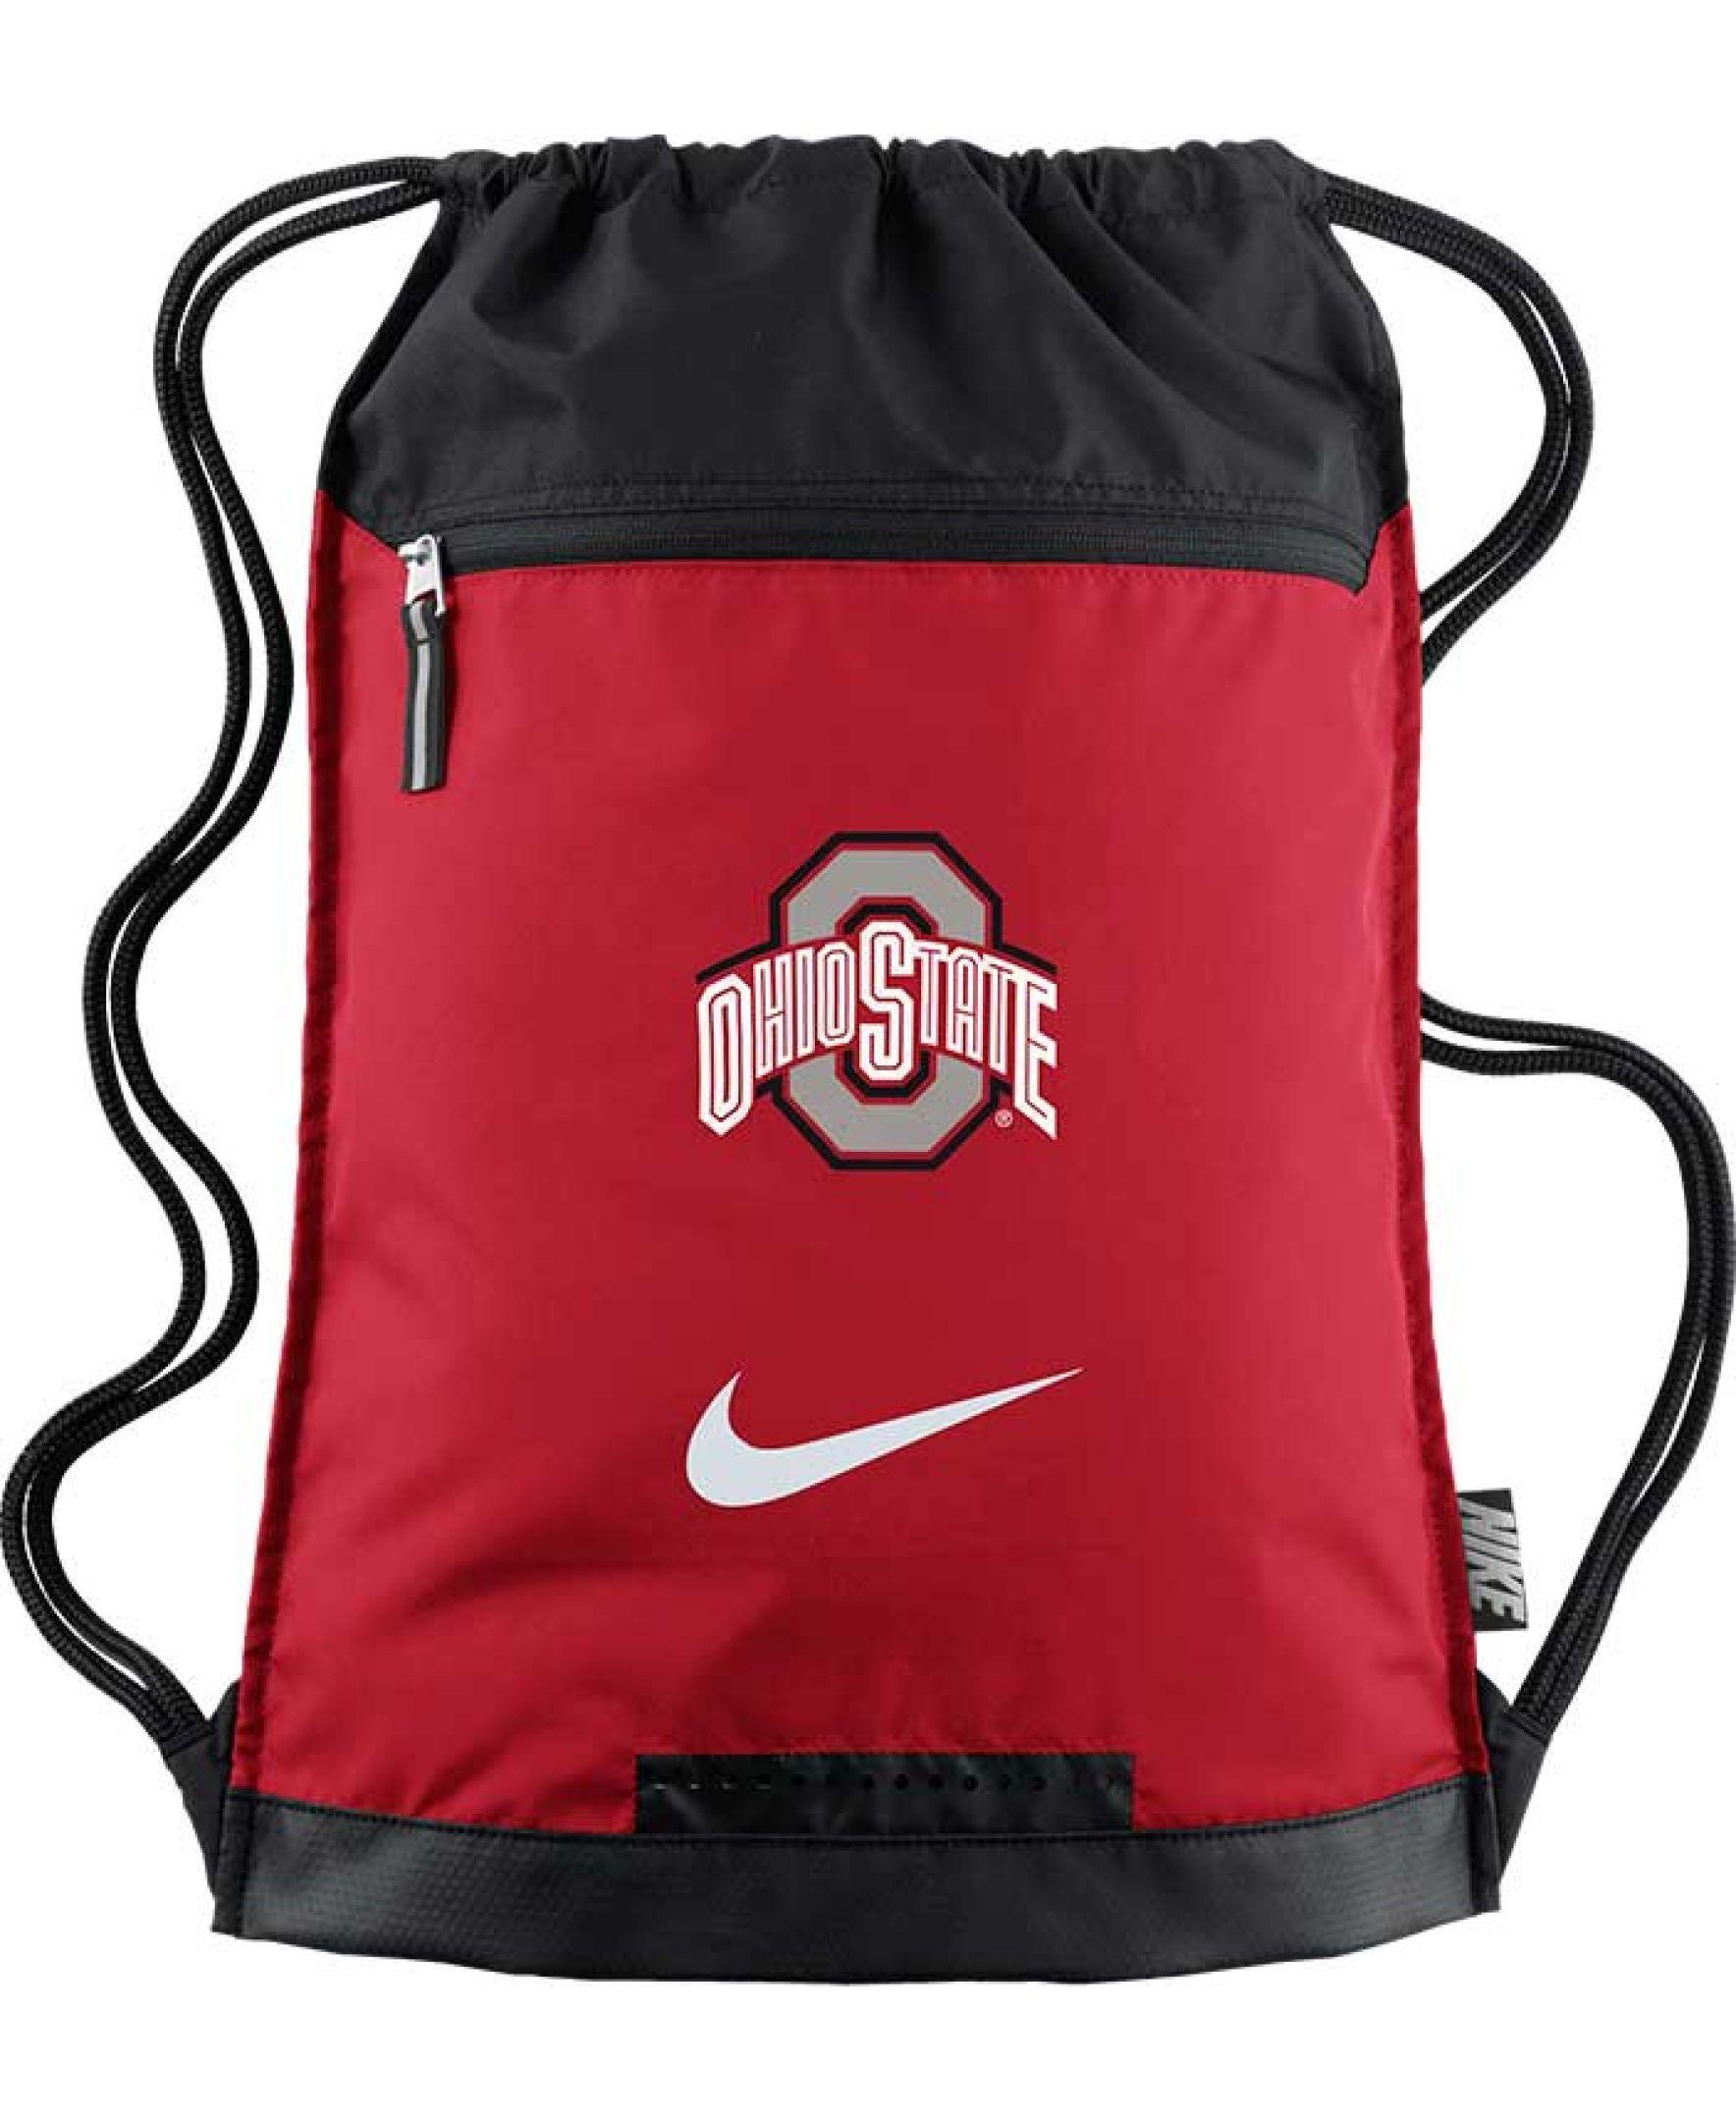 8b76dc352d Nike Ohio State Buckeyes Training Gym Bag